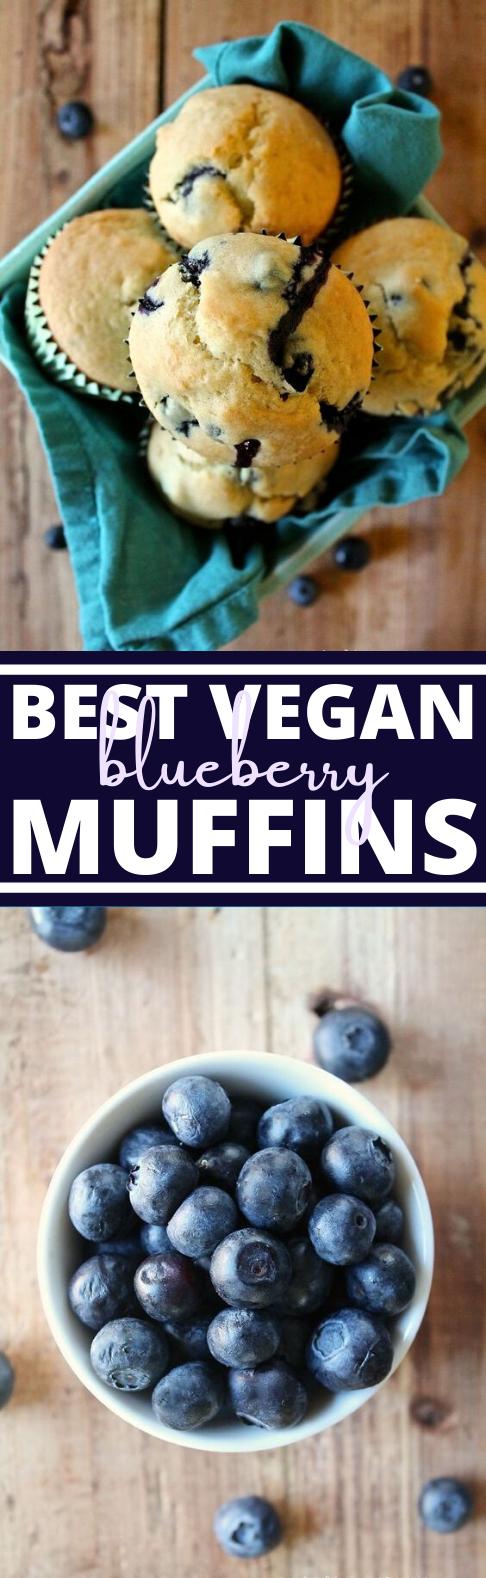 The Best Vegan Blueberry Muffins #vegan #dessert #breakfast #easy #muffin